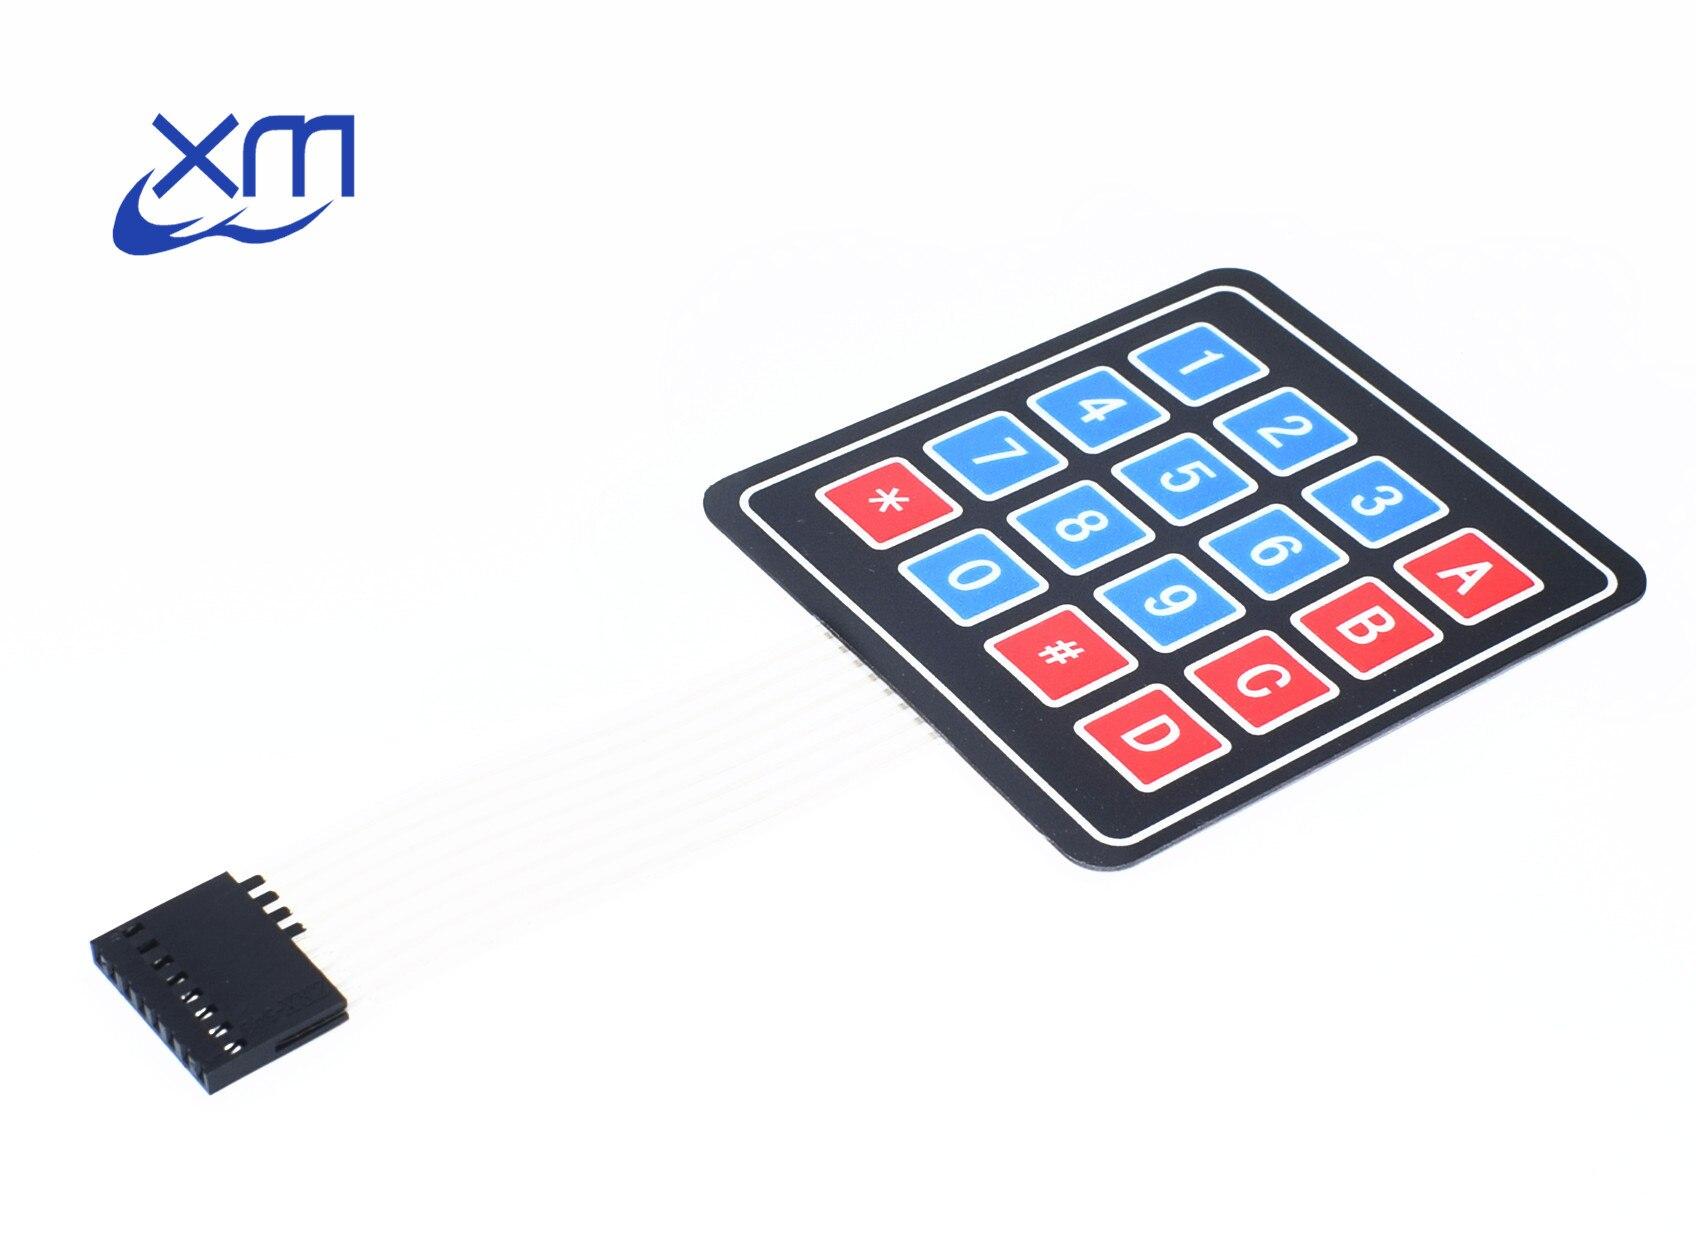 10 TEILE/LOS 4*4 Matrix Array/Matrix Tastatur 16 Key Membran Schalter Tastatur 4X4 Matrix Tastatur H75